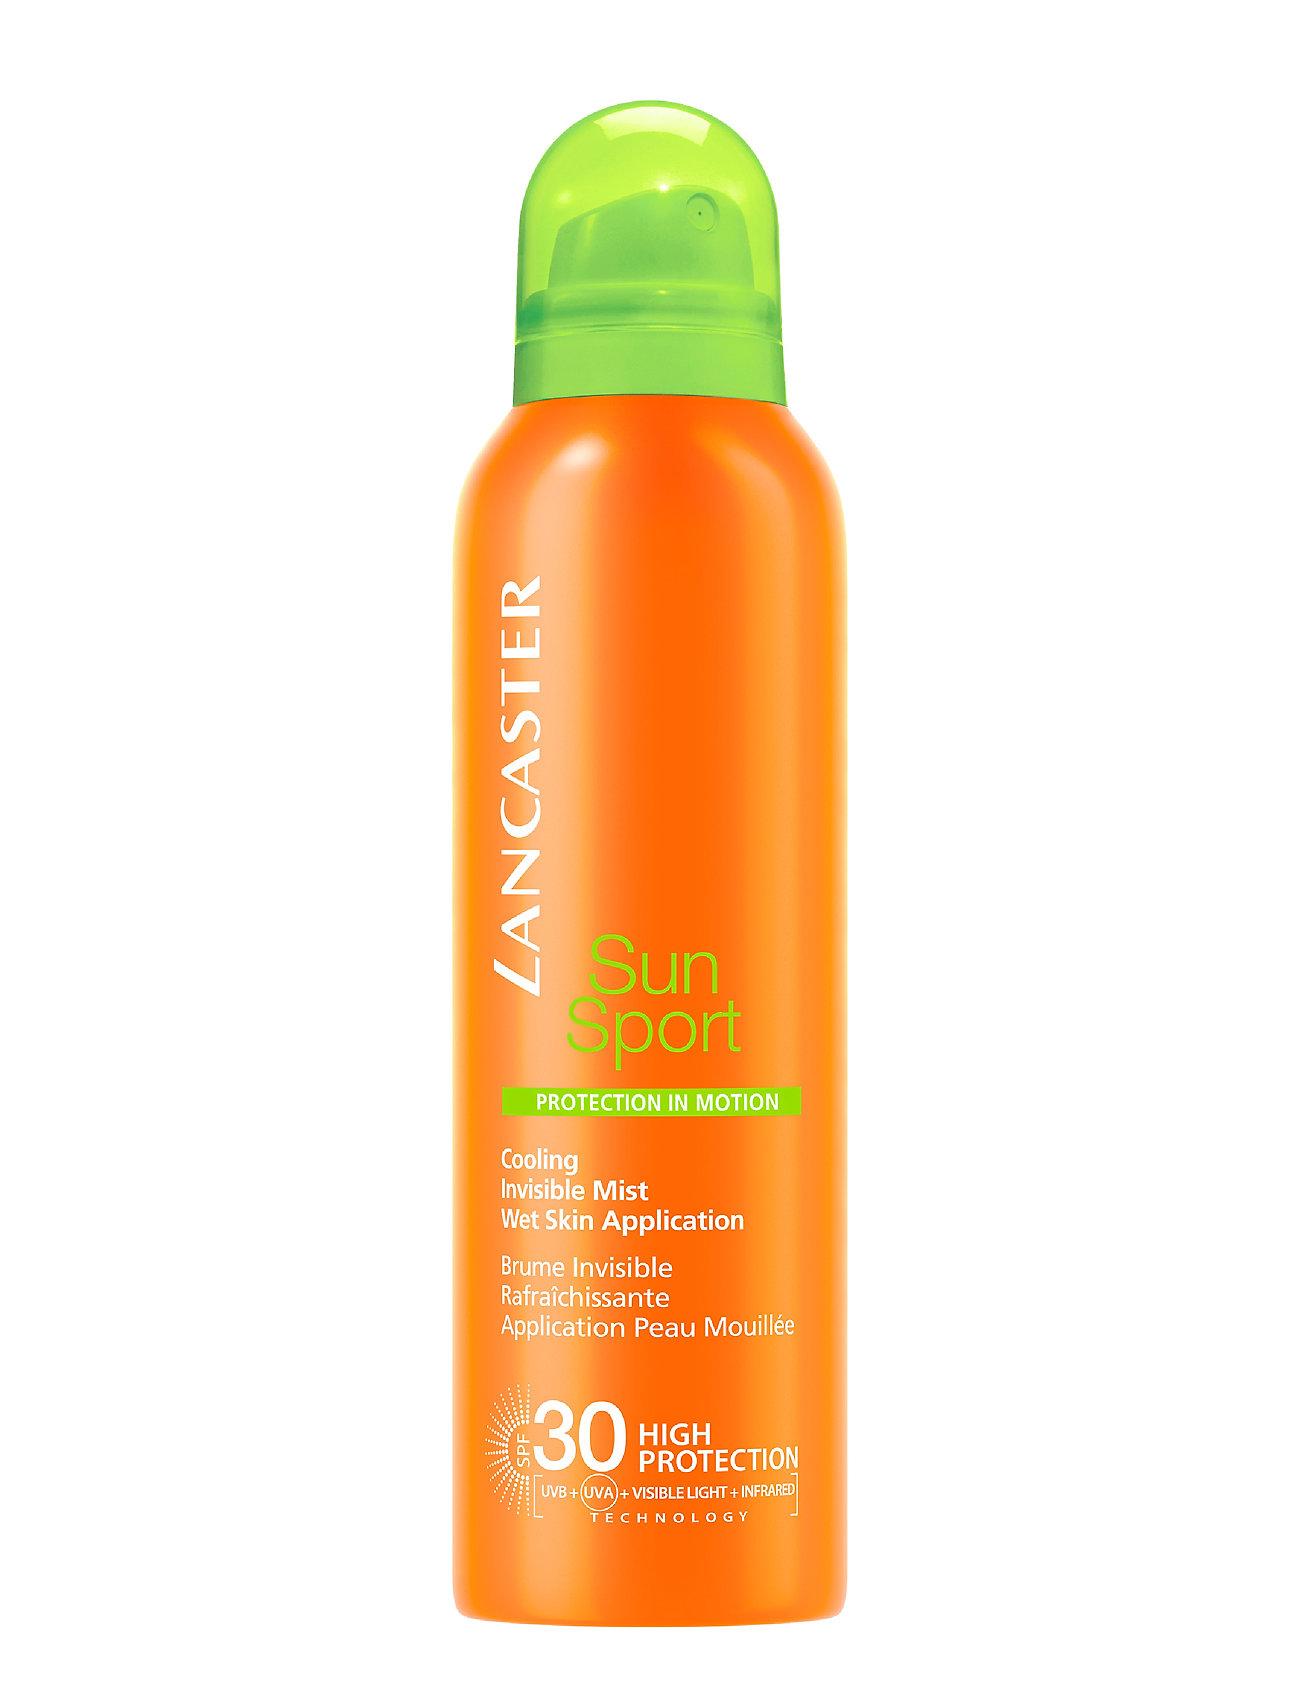 Image of Sun Sport Cooling Mist Spray Spf30 Beauty MEN Skin Care Sun Products Sports Suncare Lancaster (3467401445)